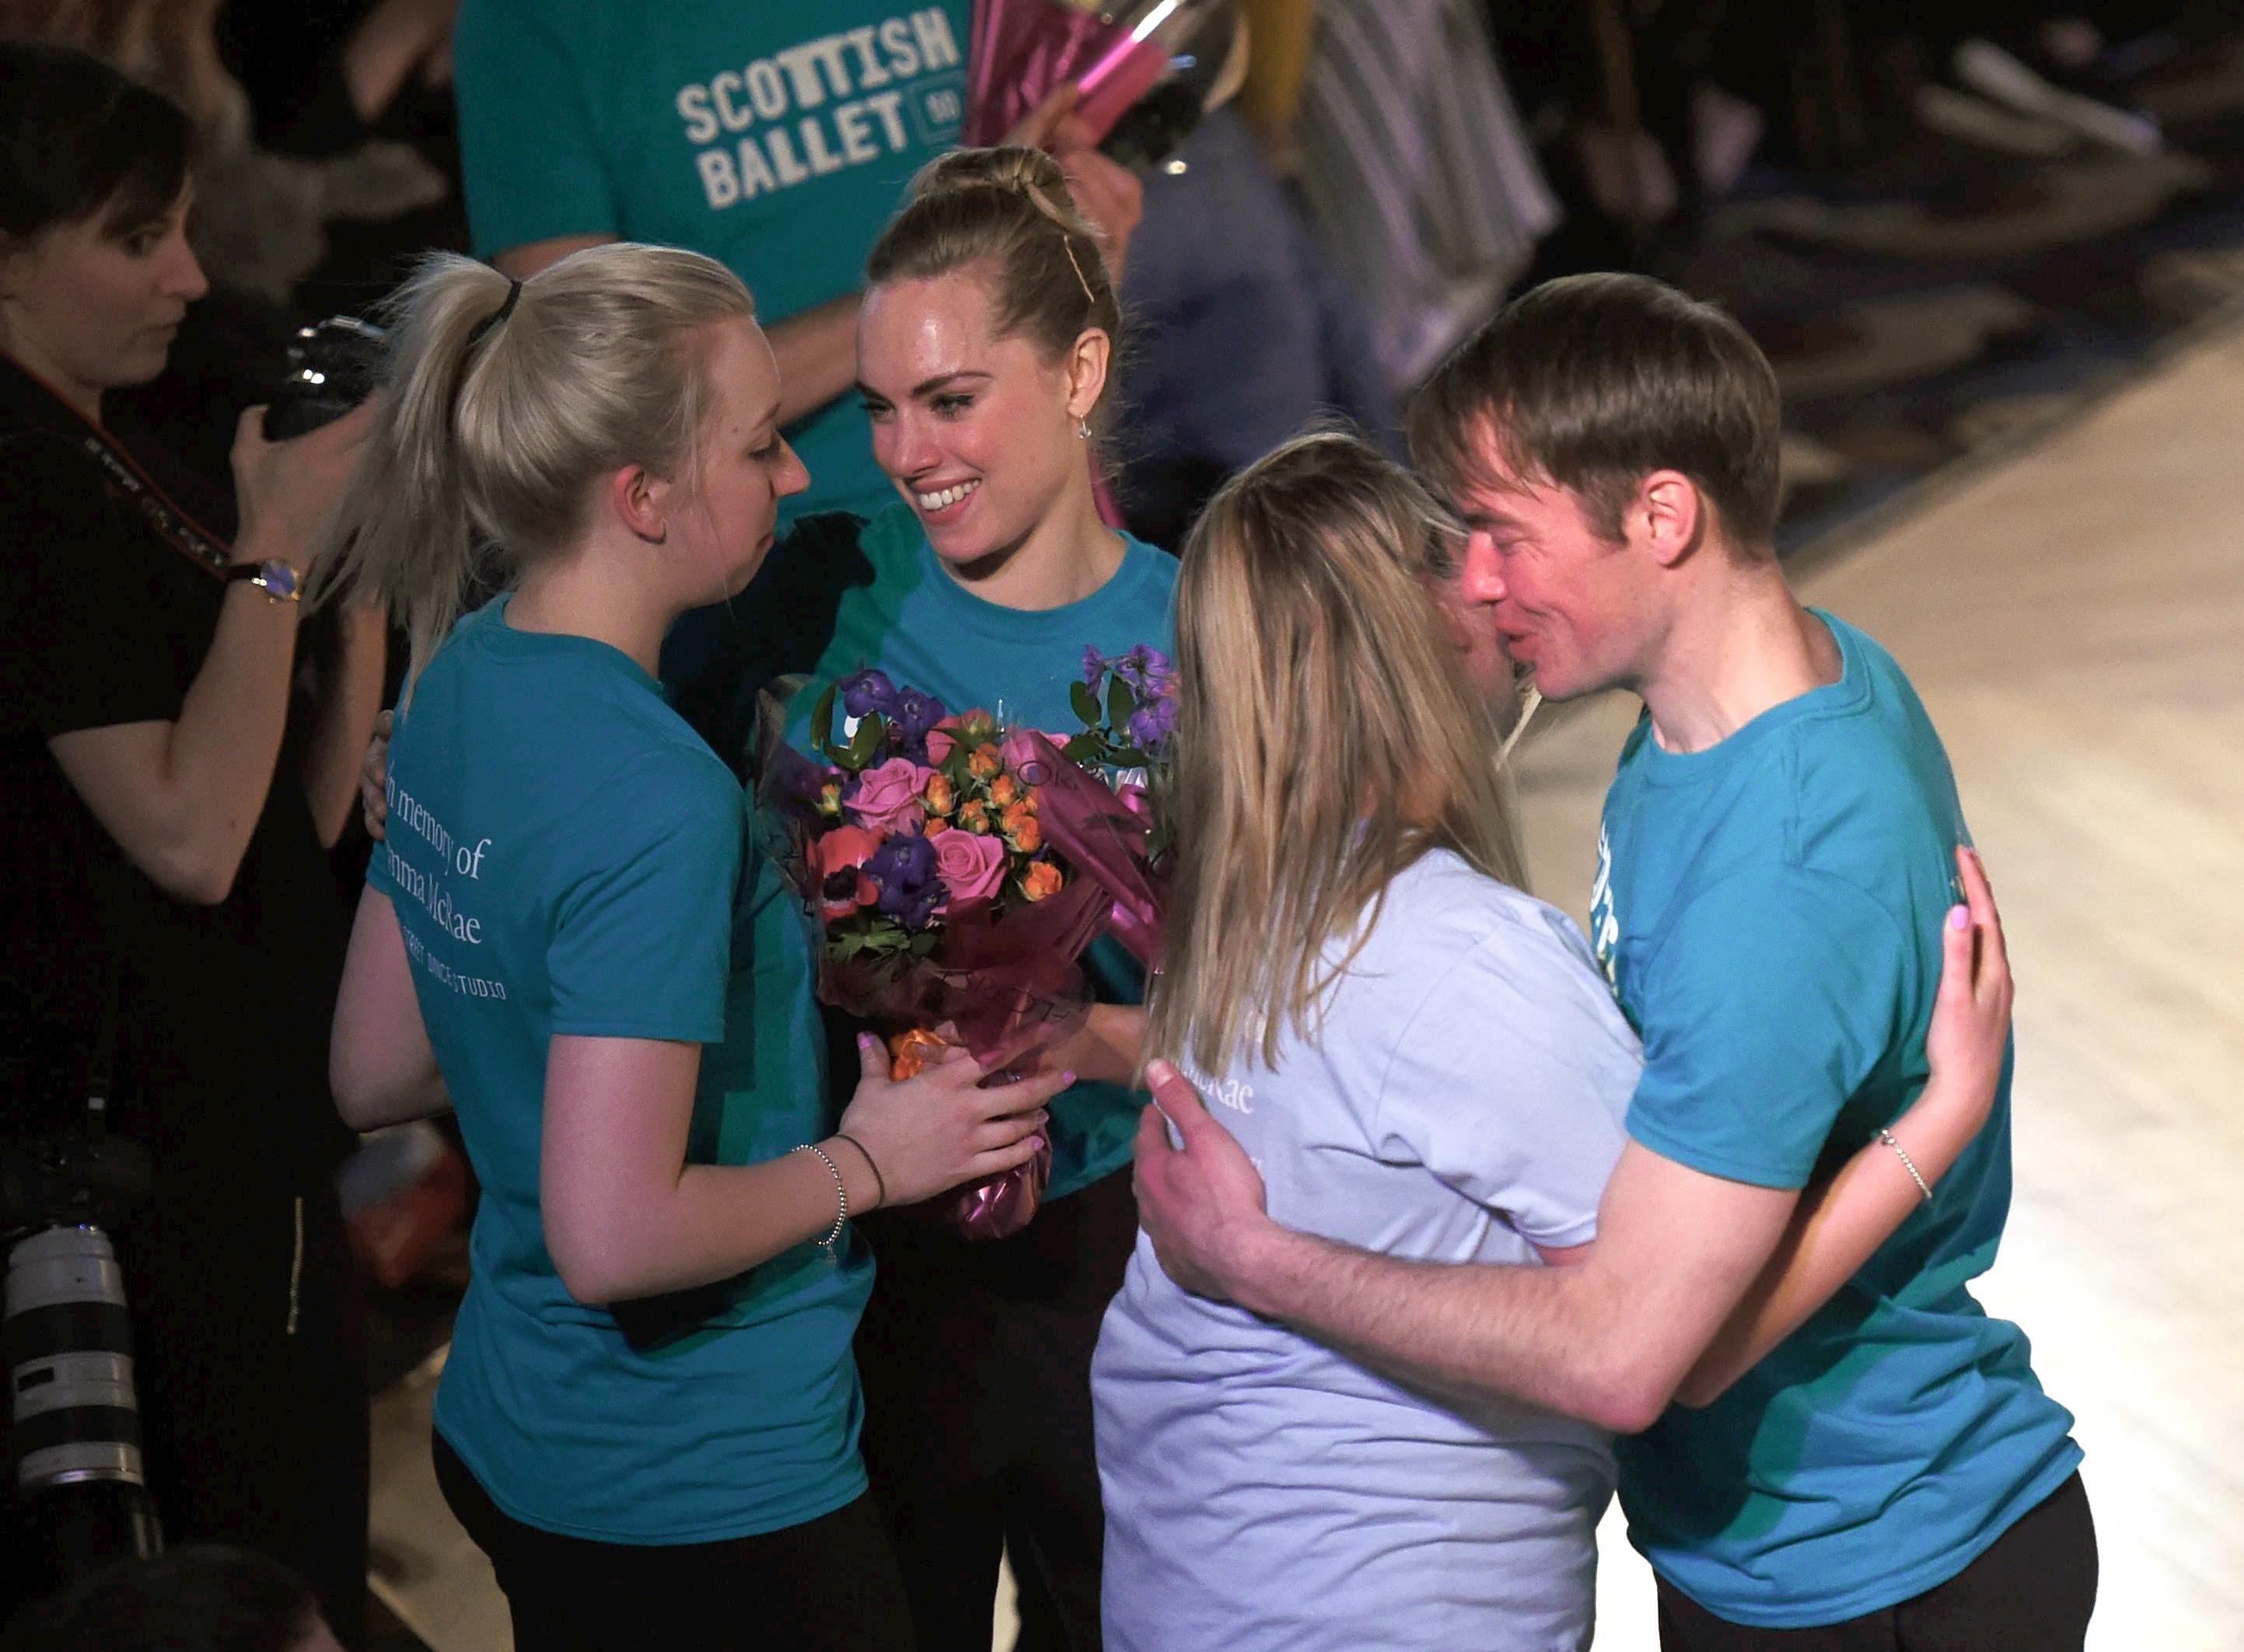 Academy Street Dance Studio having their wish granted.